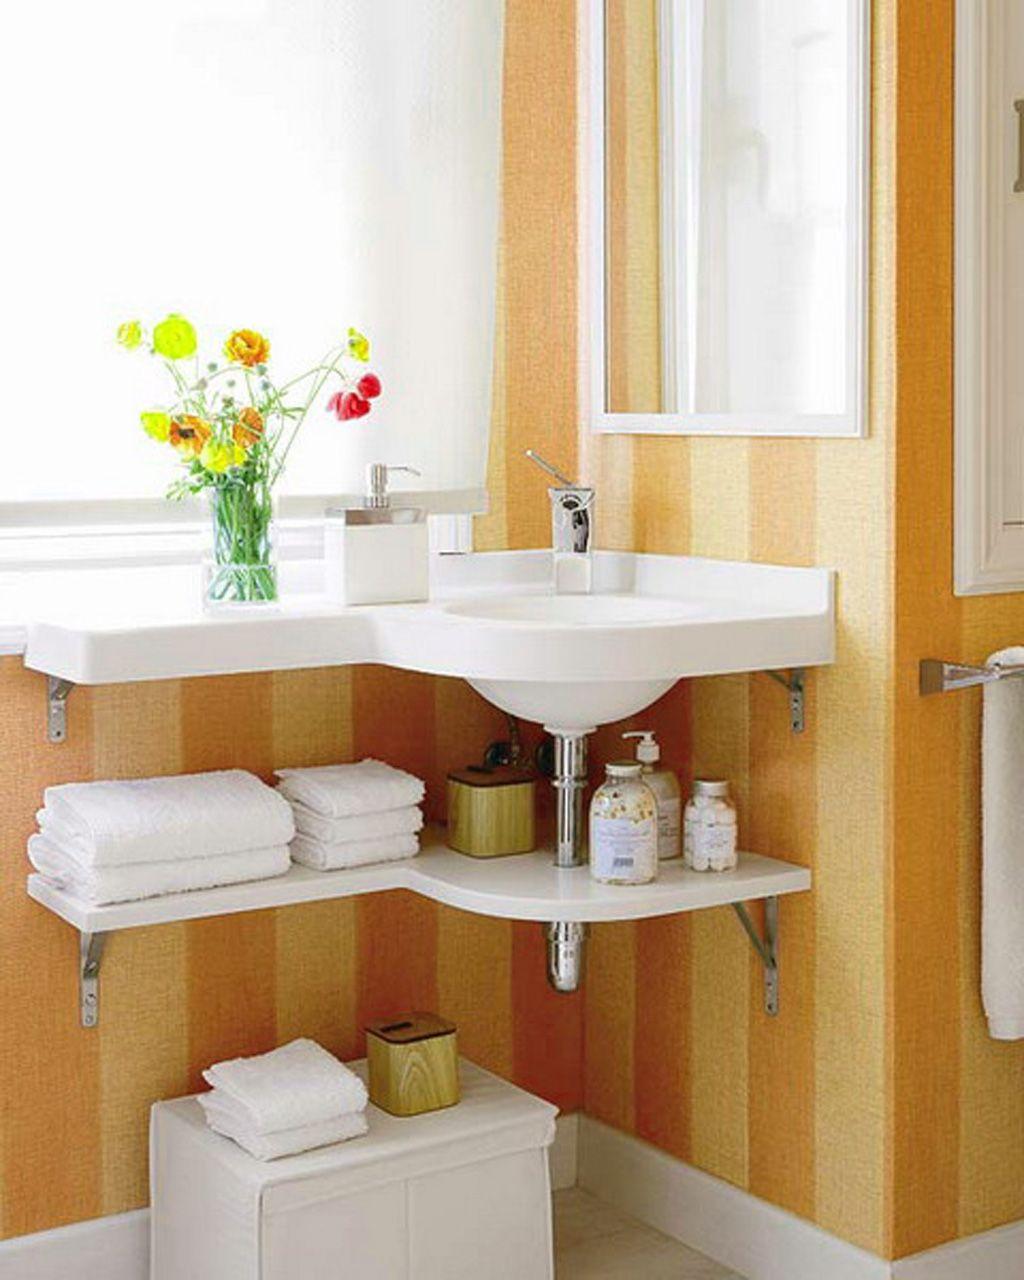 Magnificent Design Ideas Minimalist Simple Bathroom Storage Awesome Simple Bathroom Remodels Design Decoration